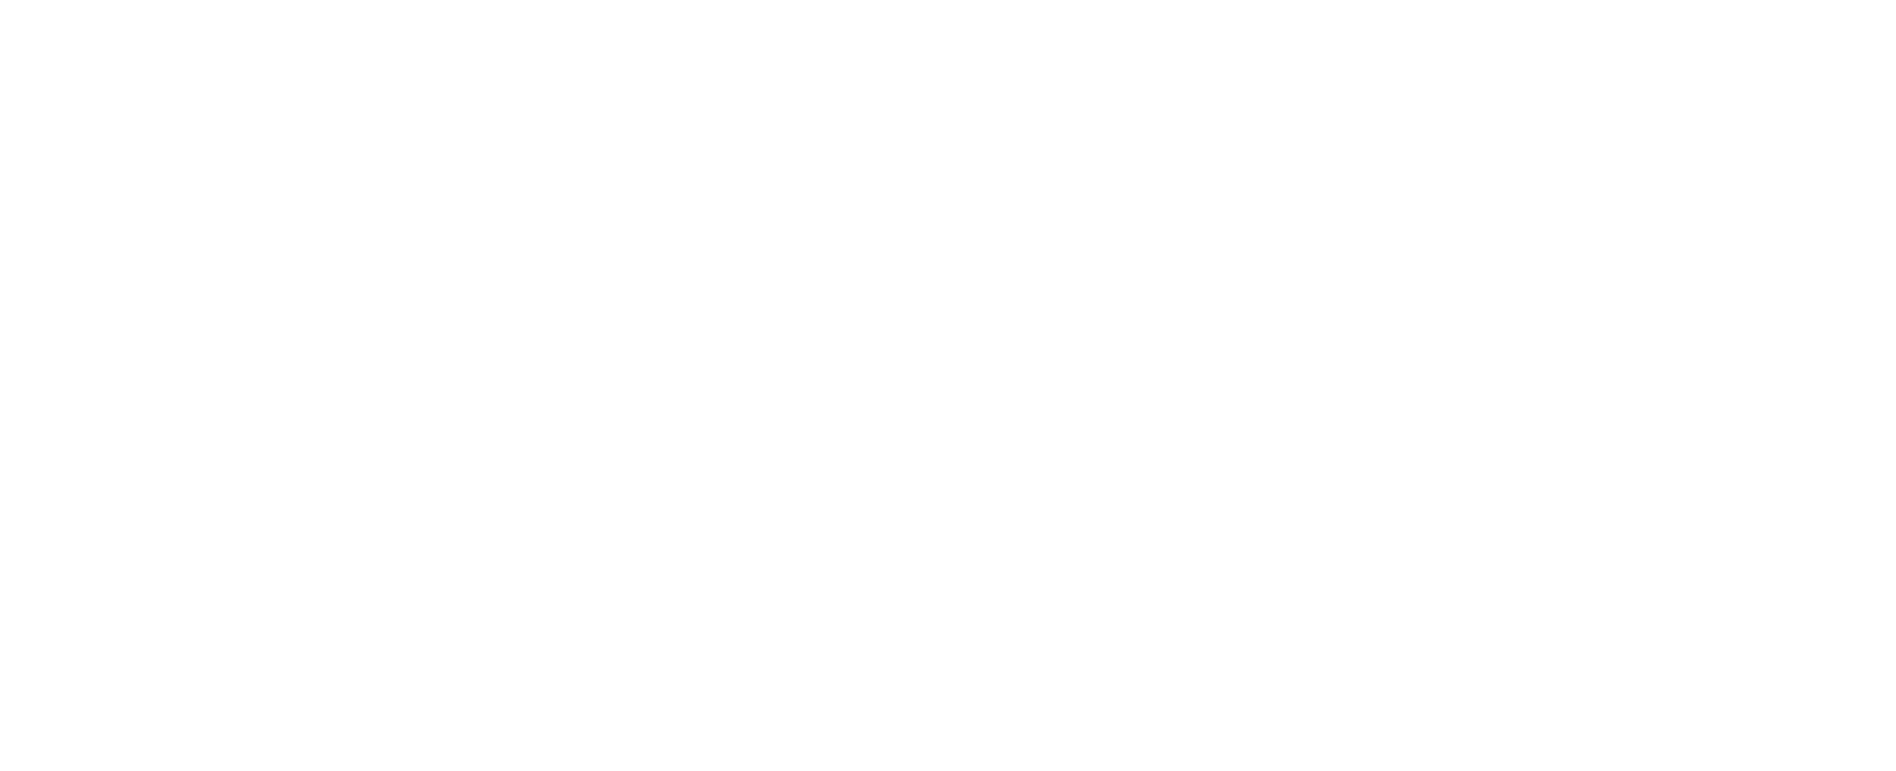 filments-1.house_minimal_black_small_2